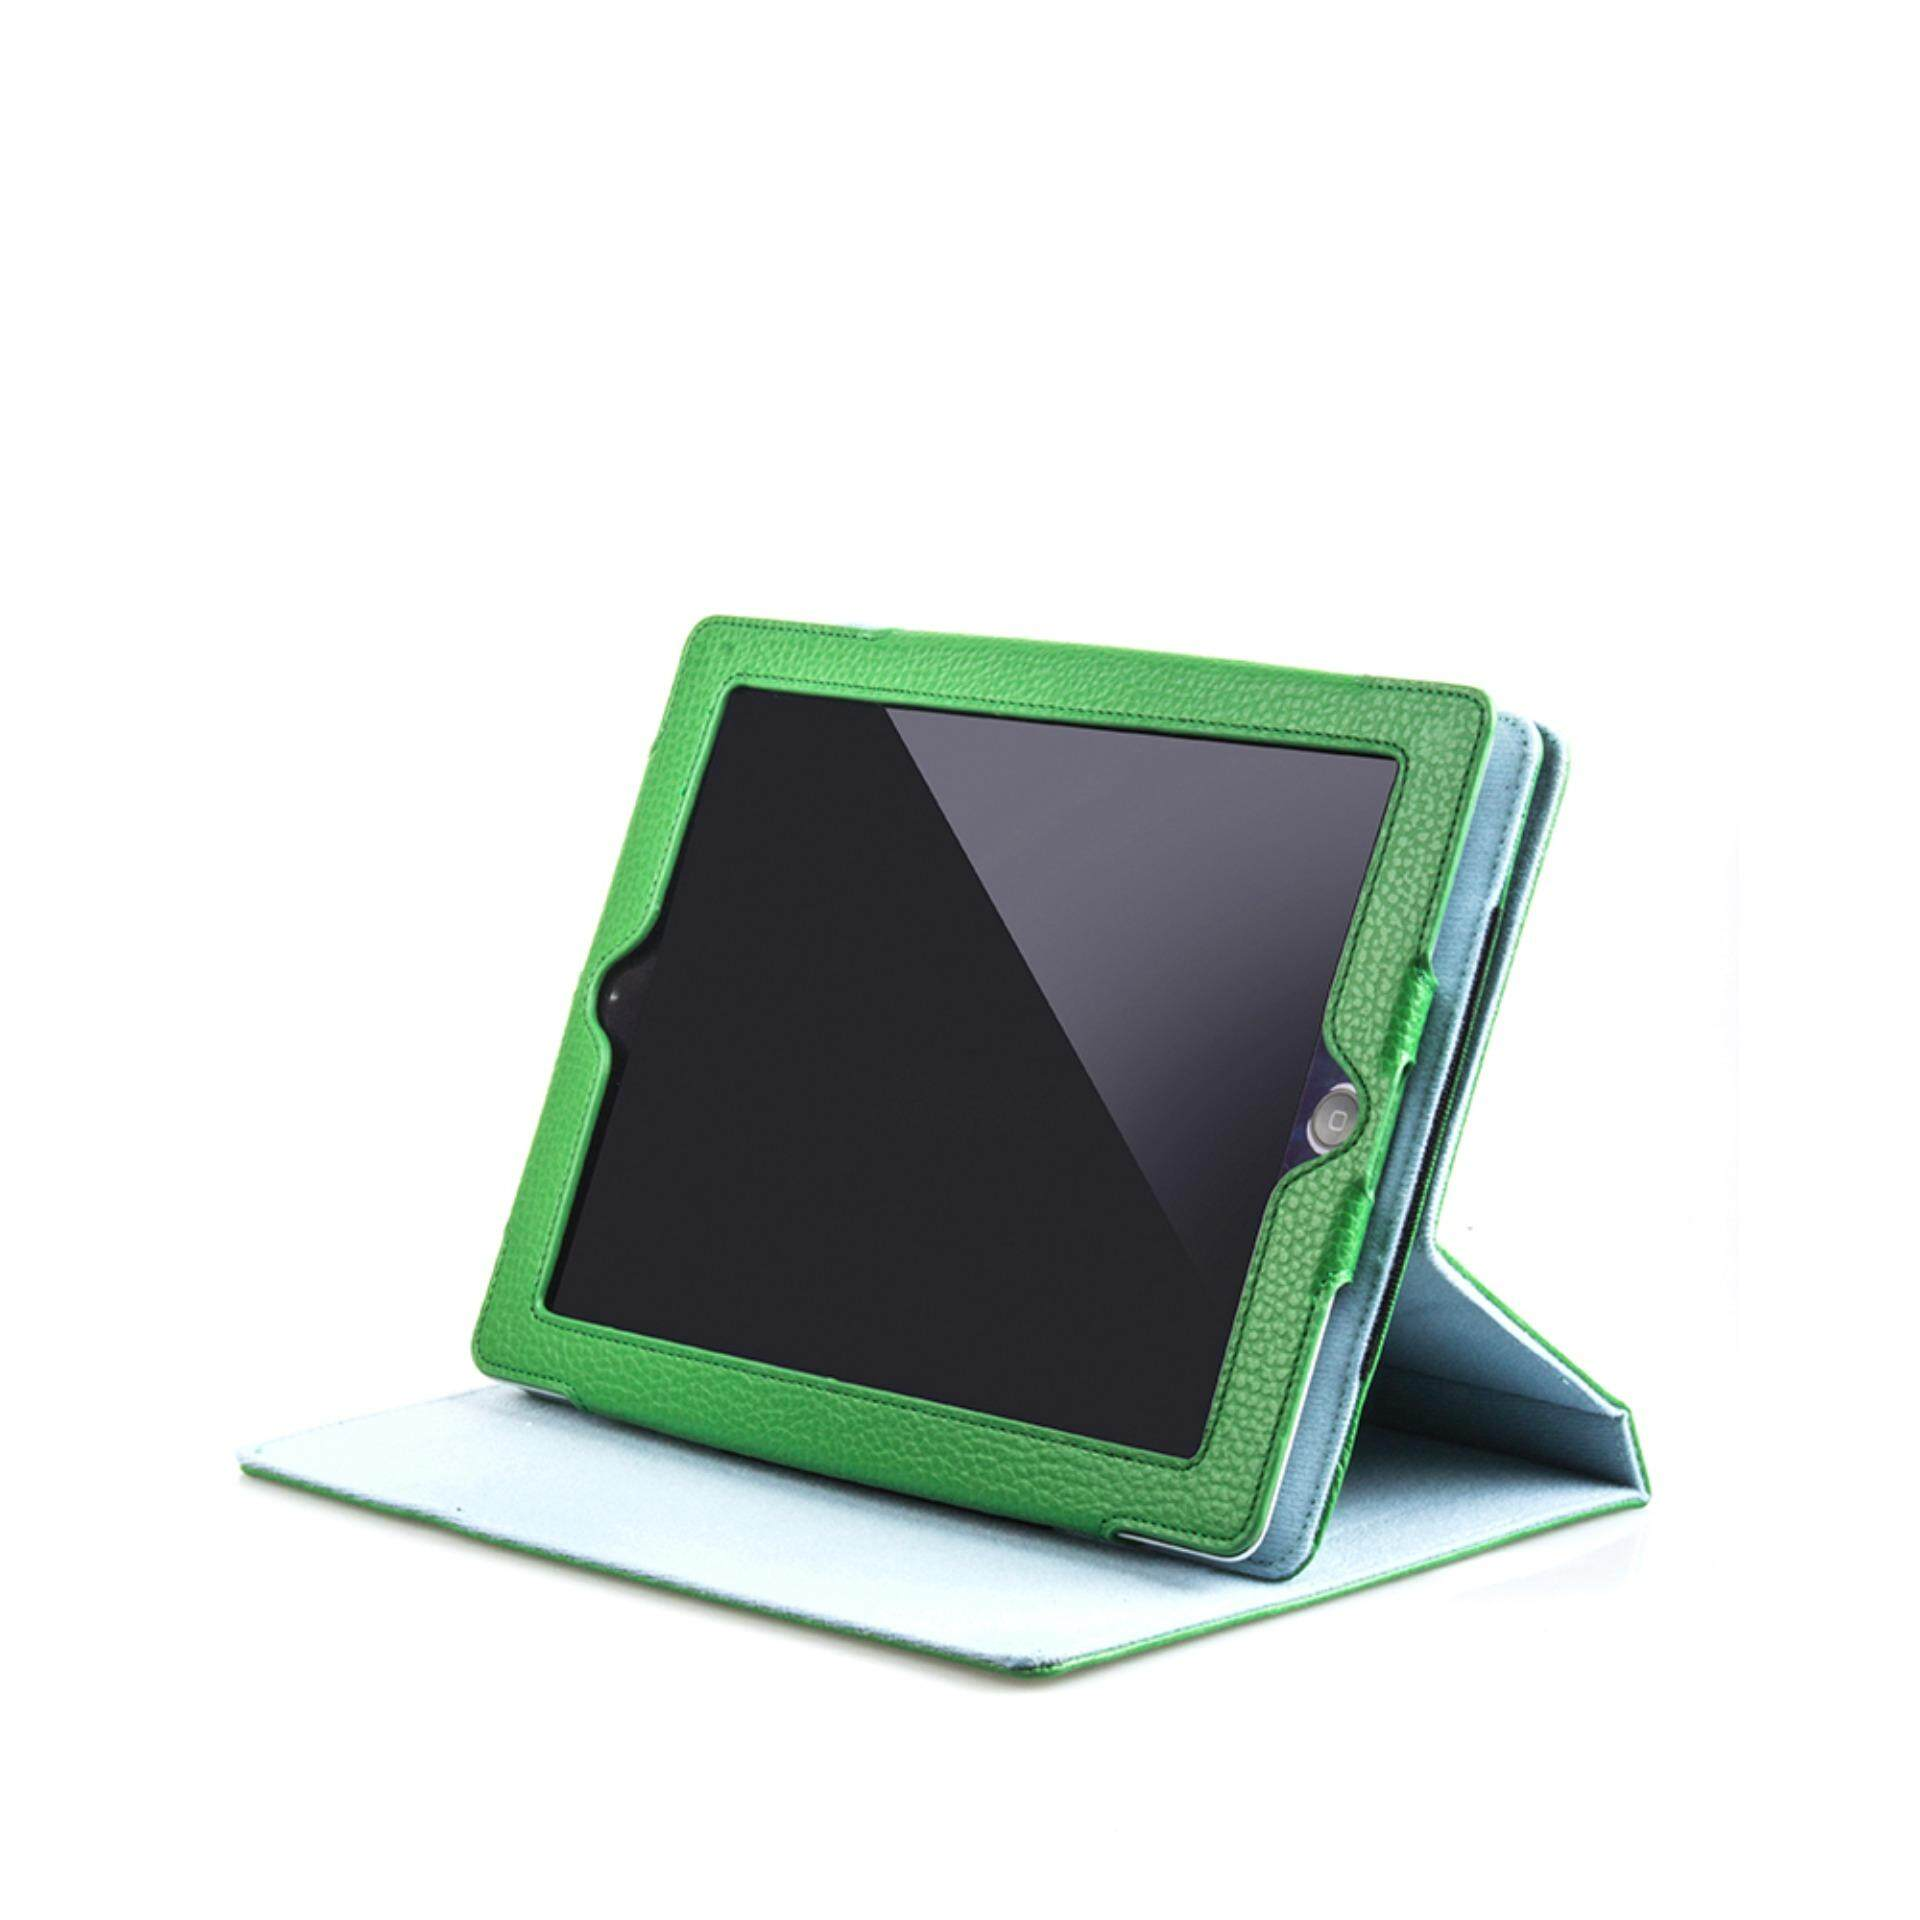 quality design f577f f30c2 KARUNA iPad 4/3/2 Cover with Free 3,000 mAh Lithium Polymer Power Bank